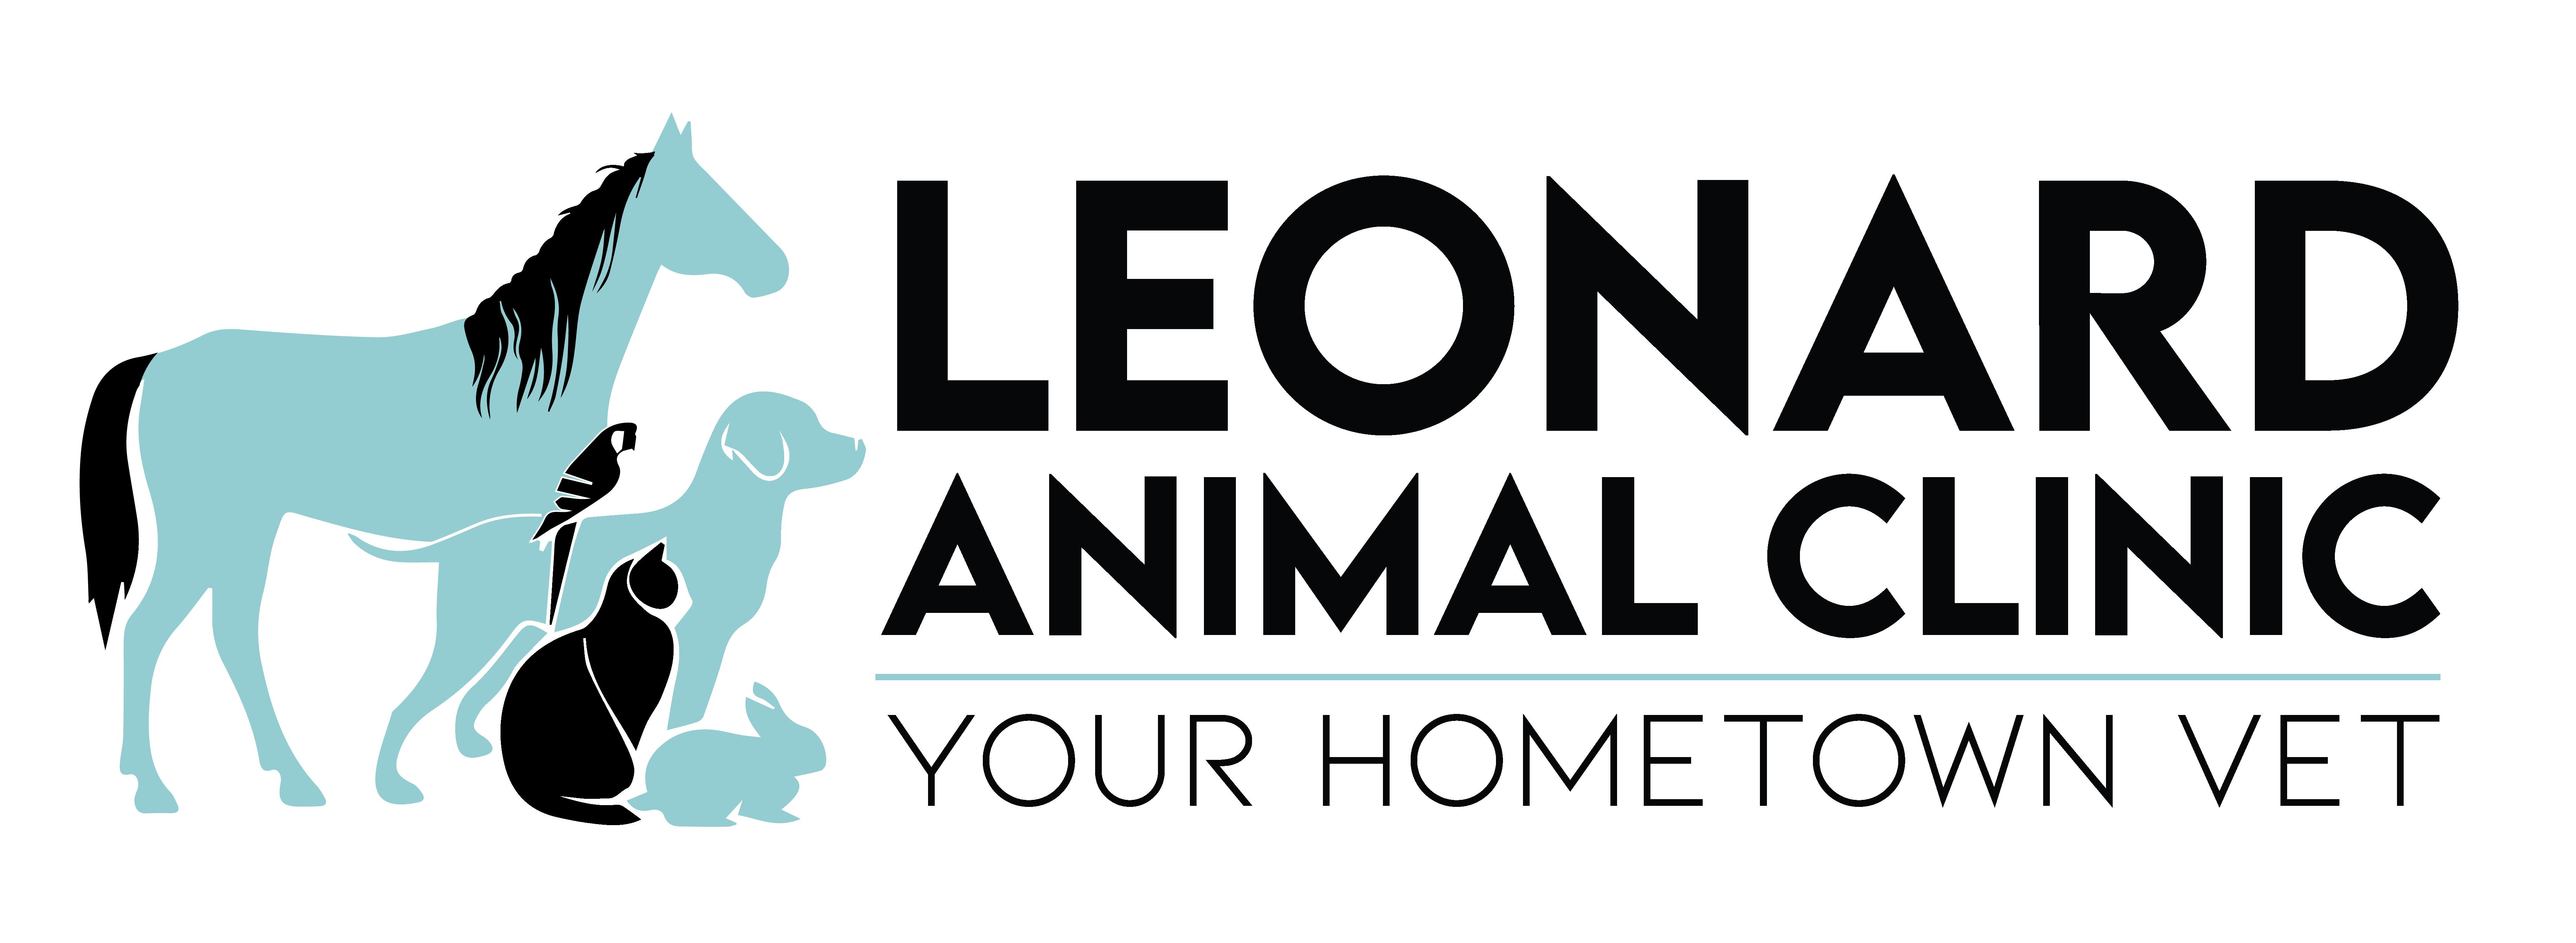 Leonard Animal Clinic